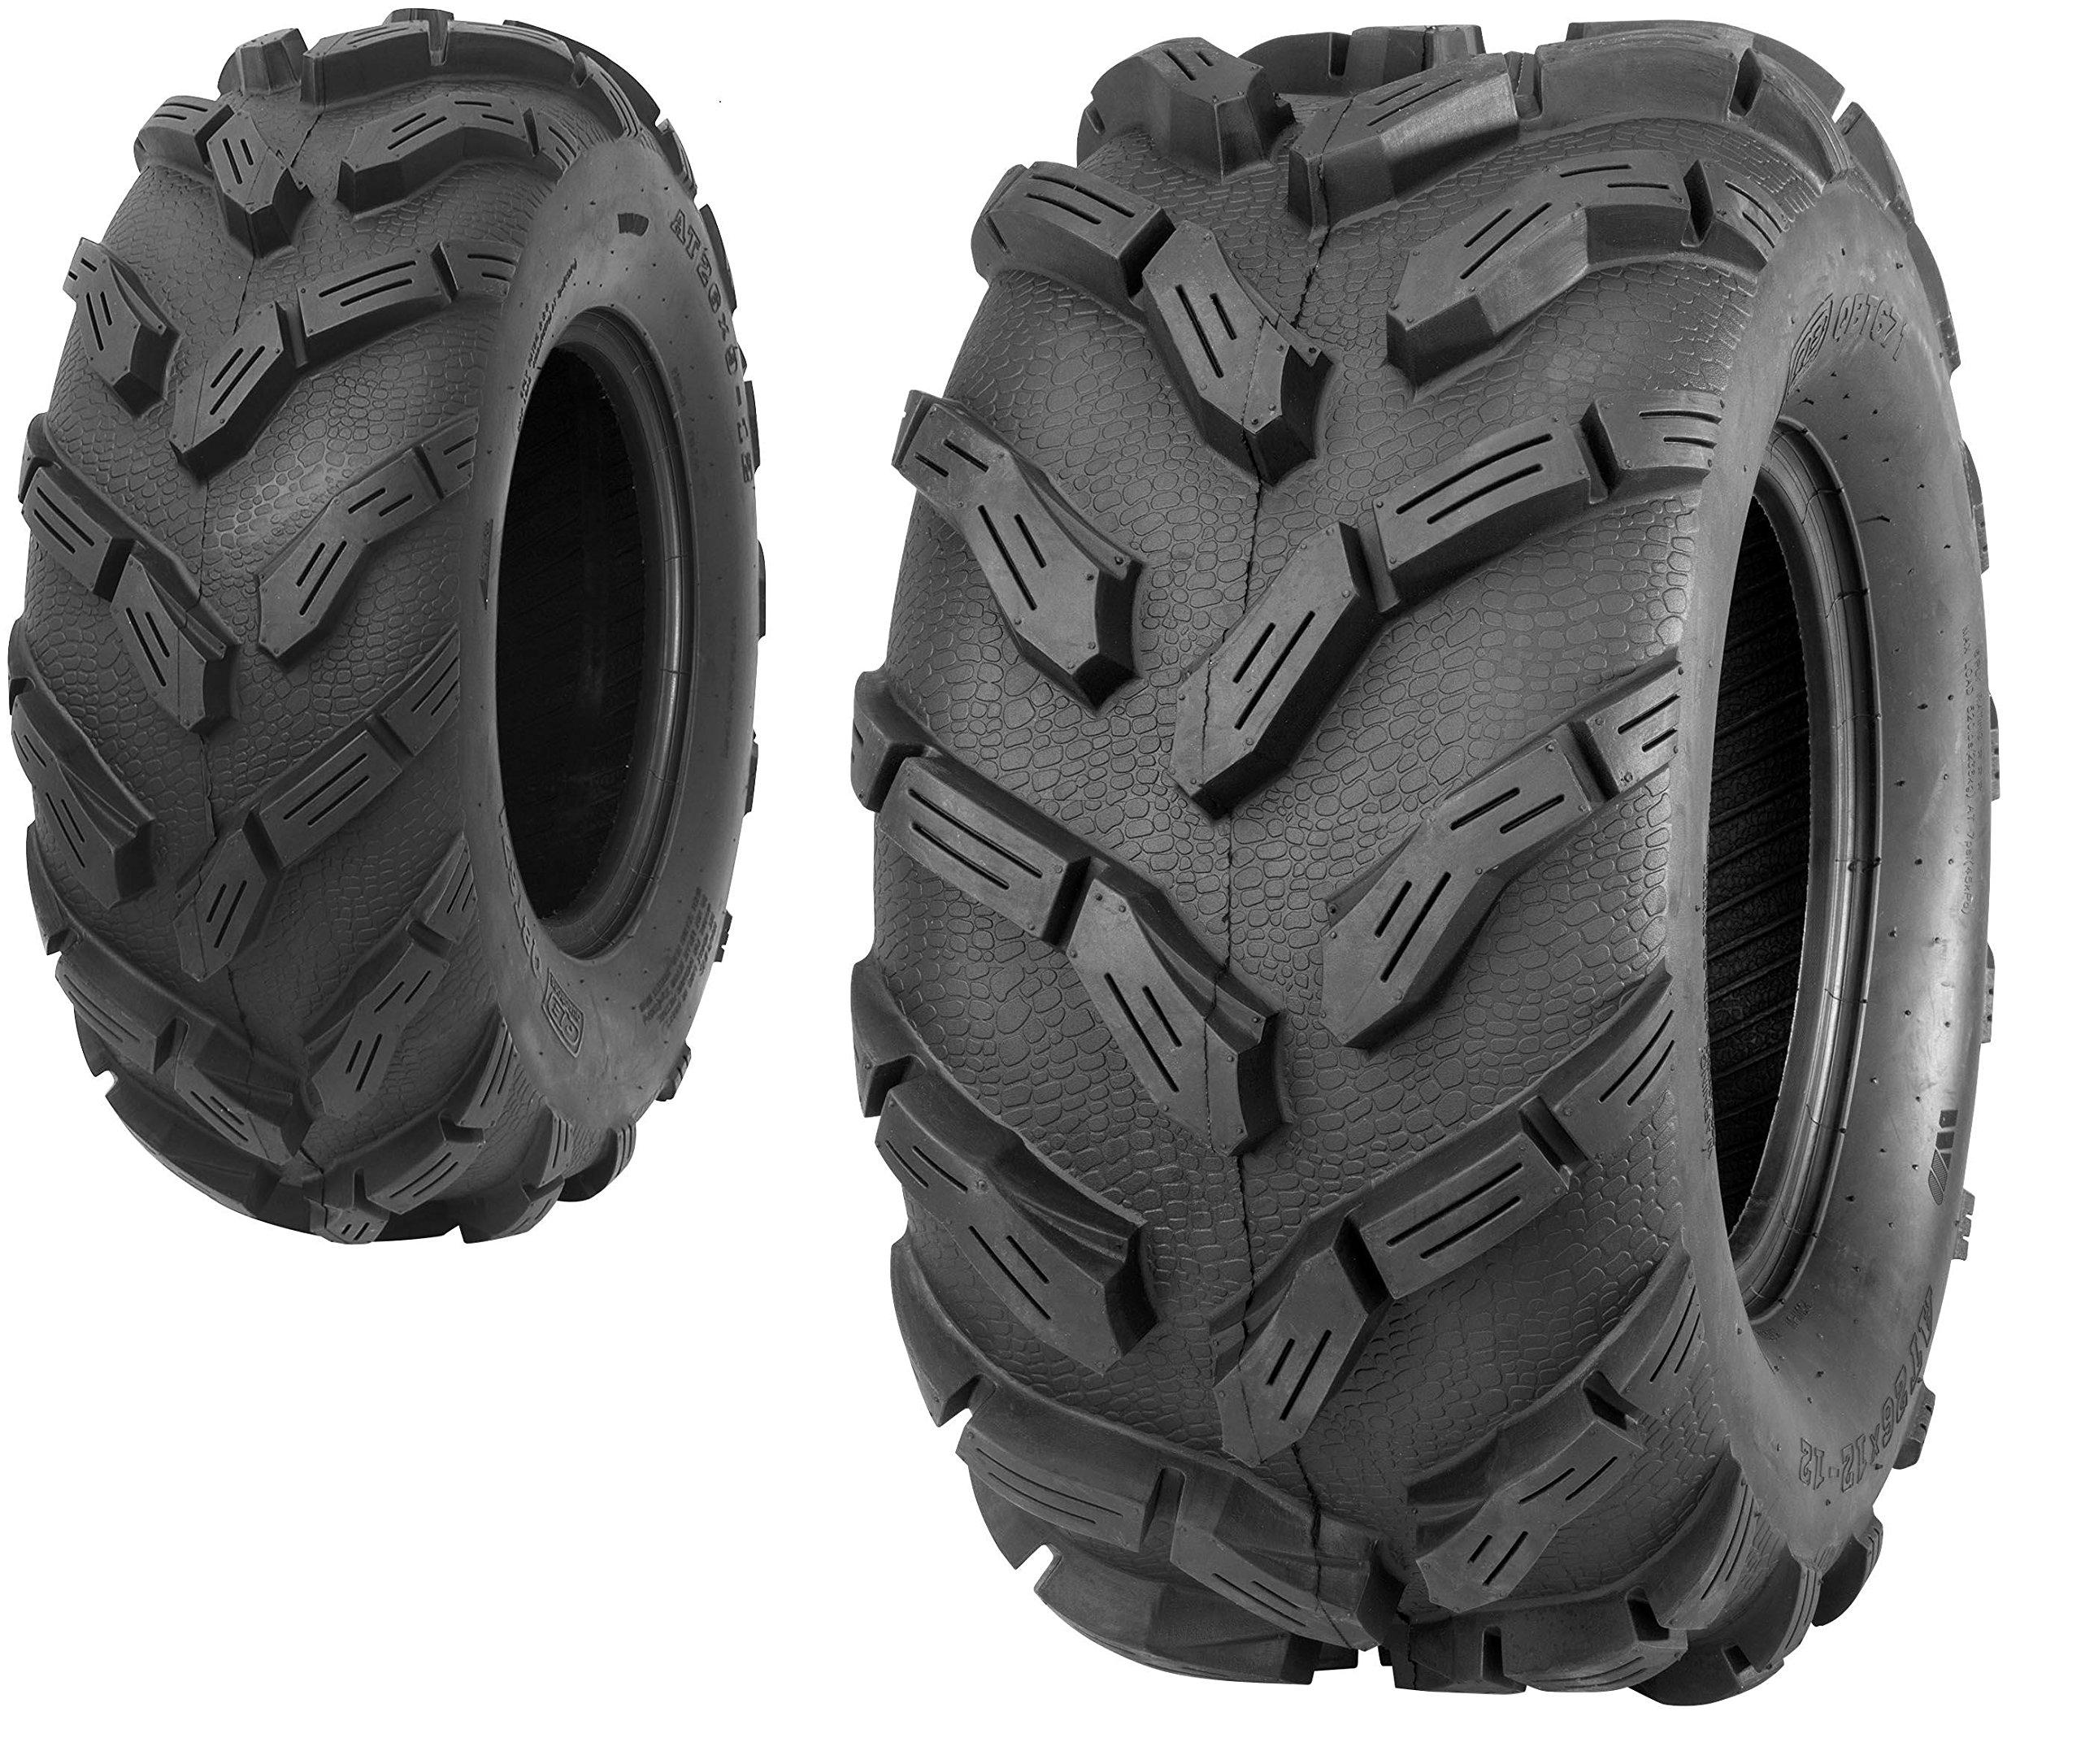 Quadboss QBT671 26x9-12 6-Ply Front Tire P3011-26X9-12